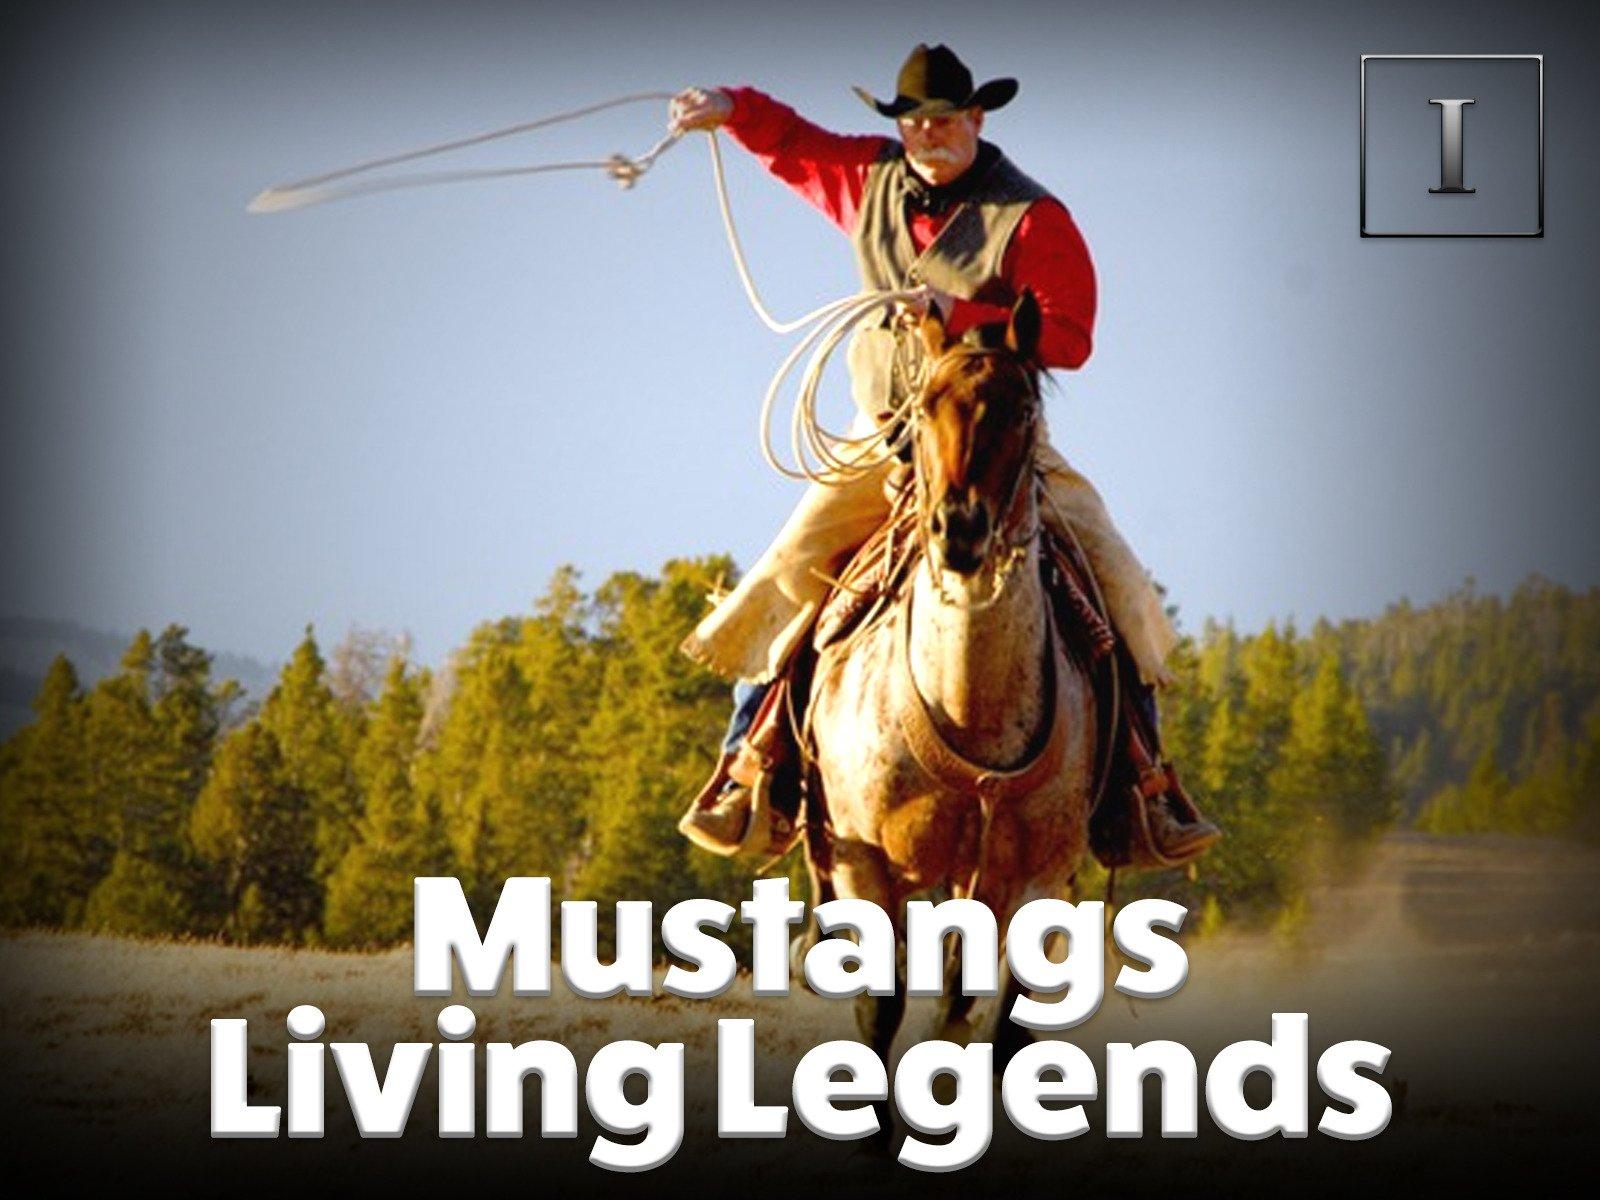 Mustangs - Living Legends on Amazon Prime Video UK